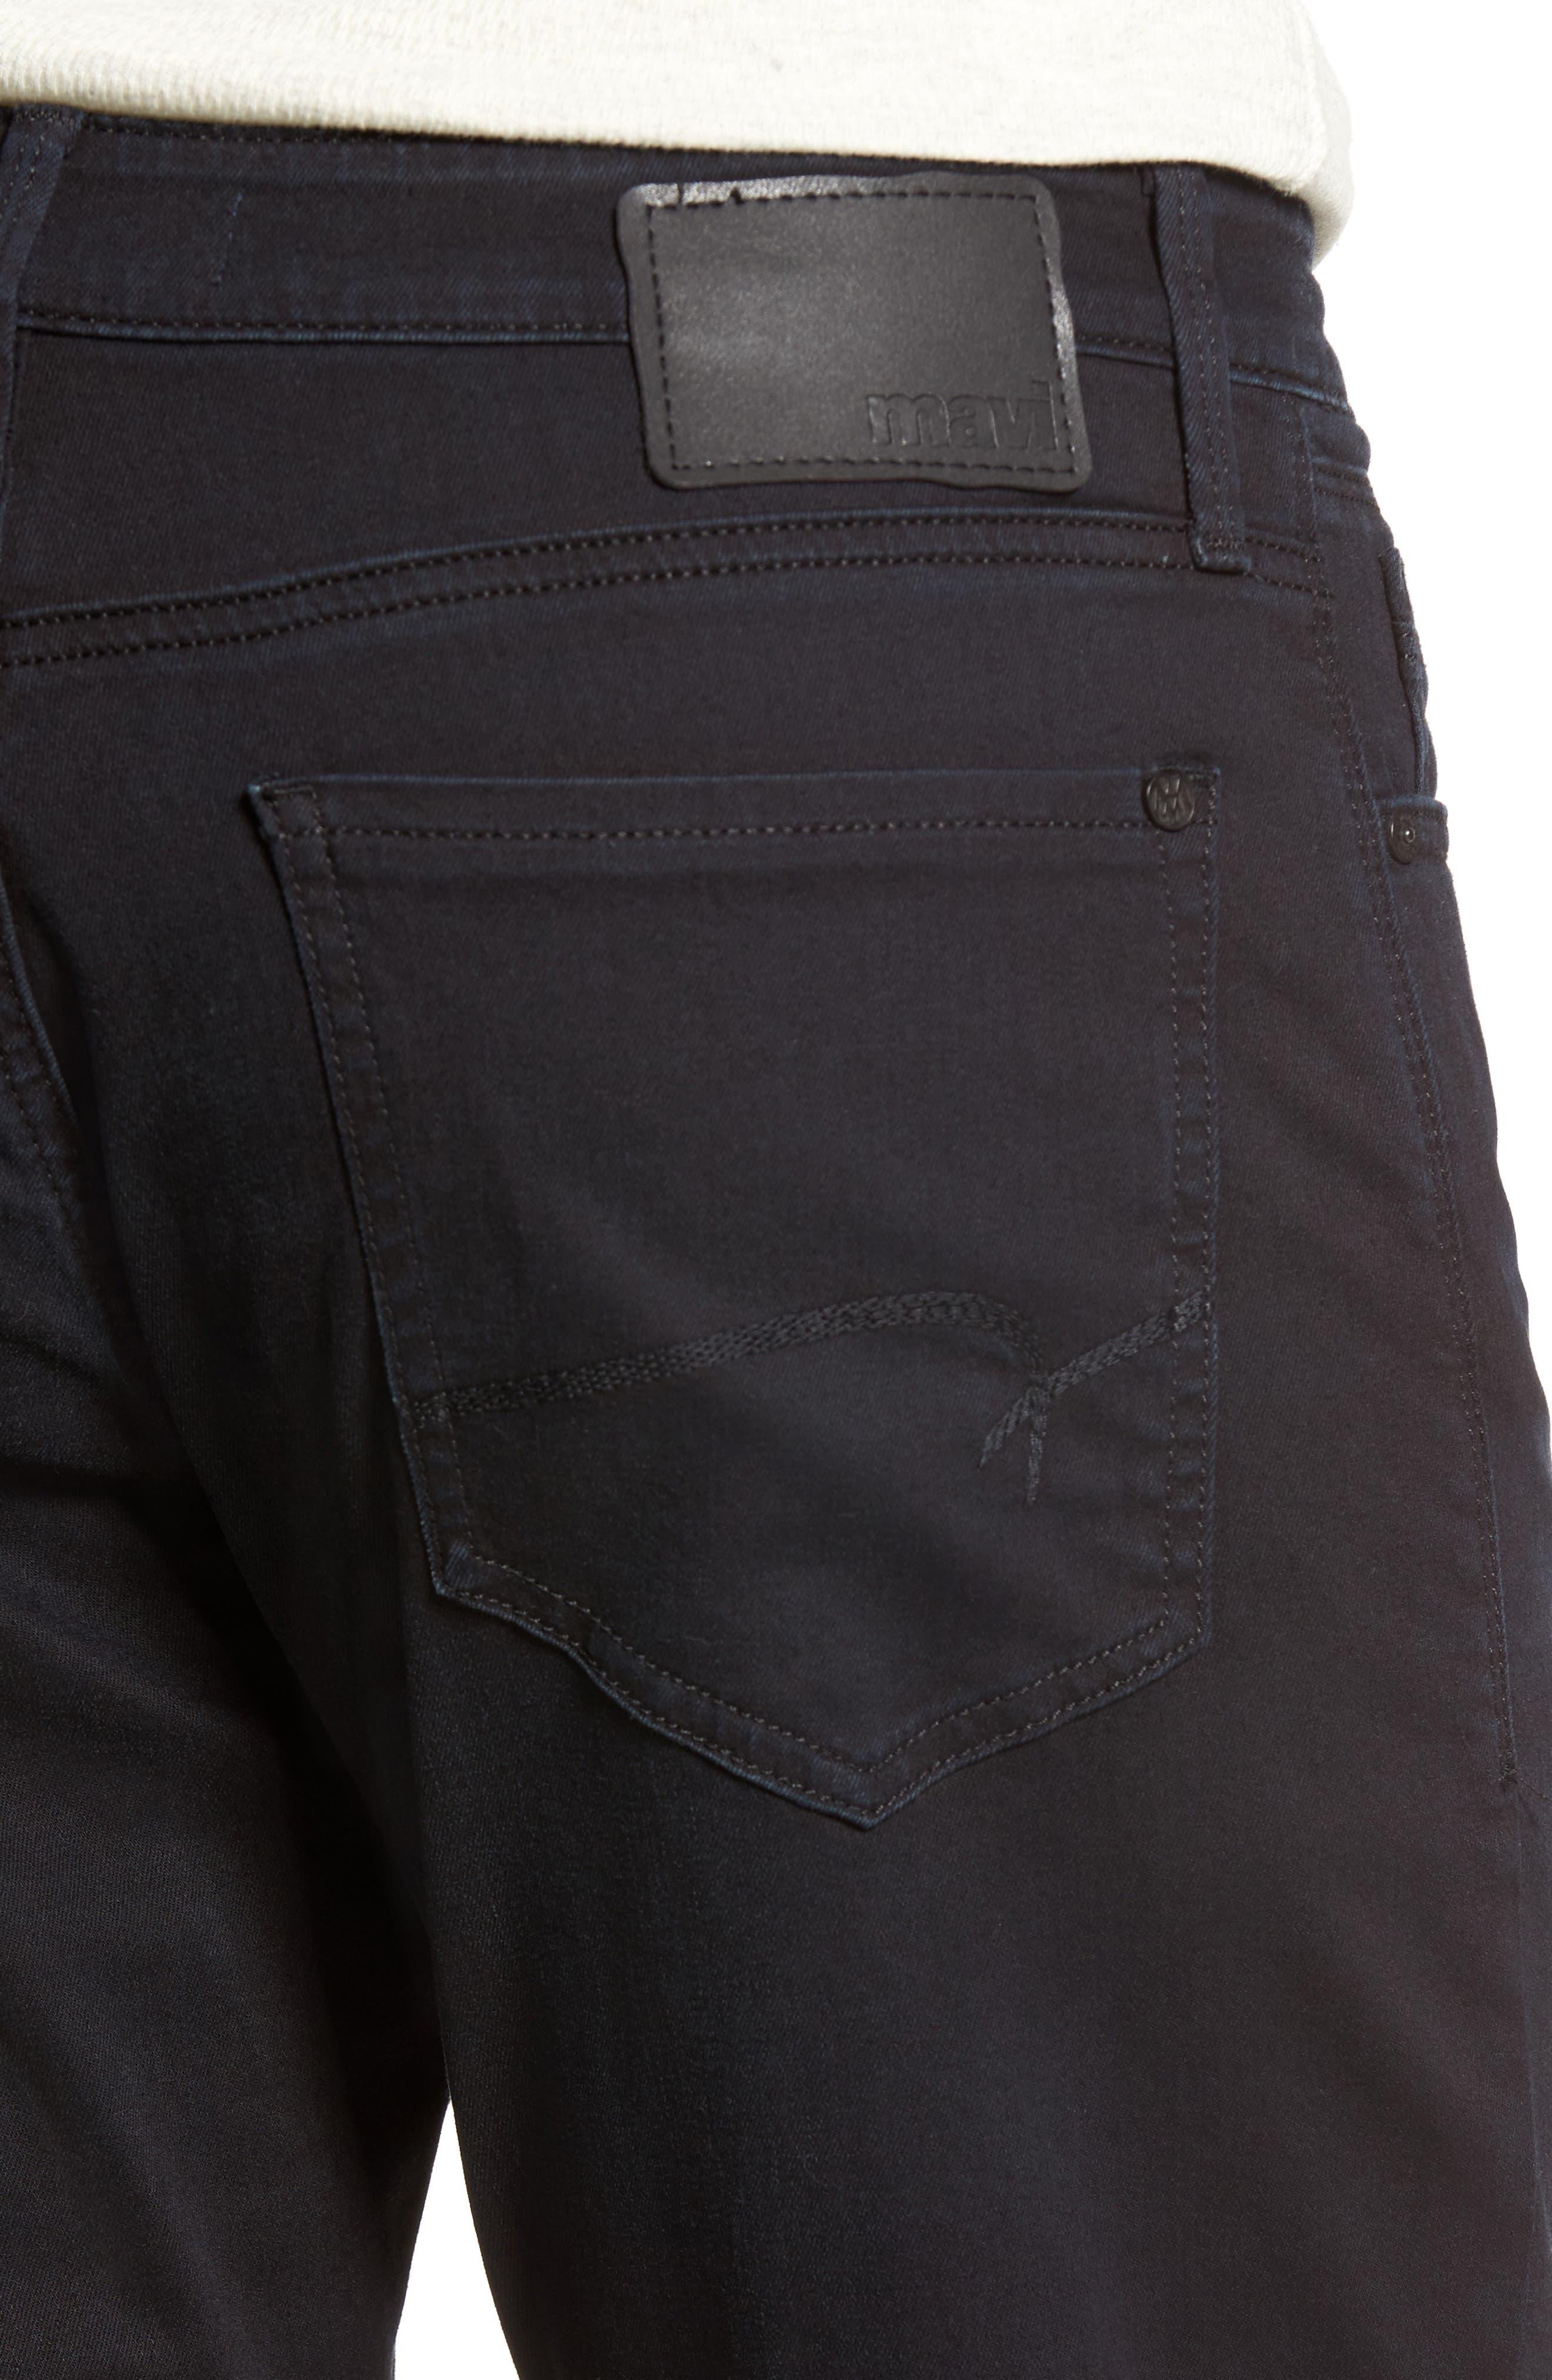 Matt Relaxed Fit Jeans,                             Alternate thumbnail 4, color,                             Blue Black